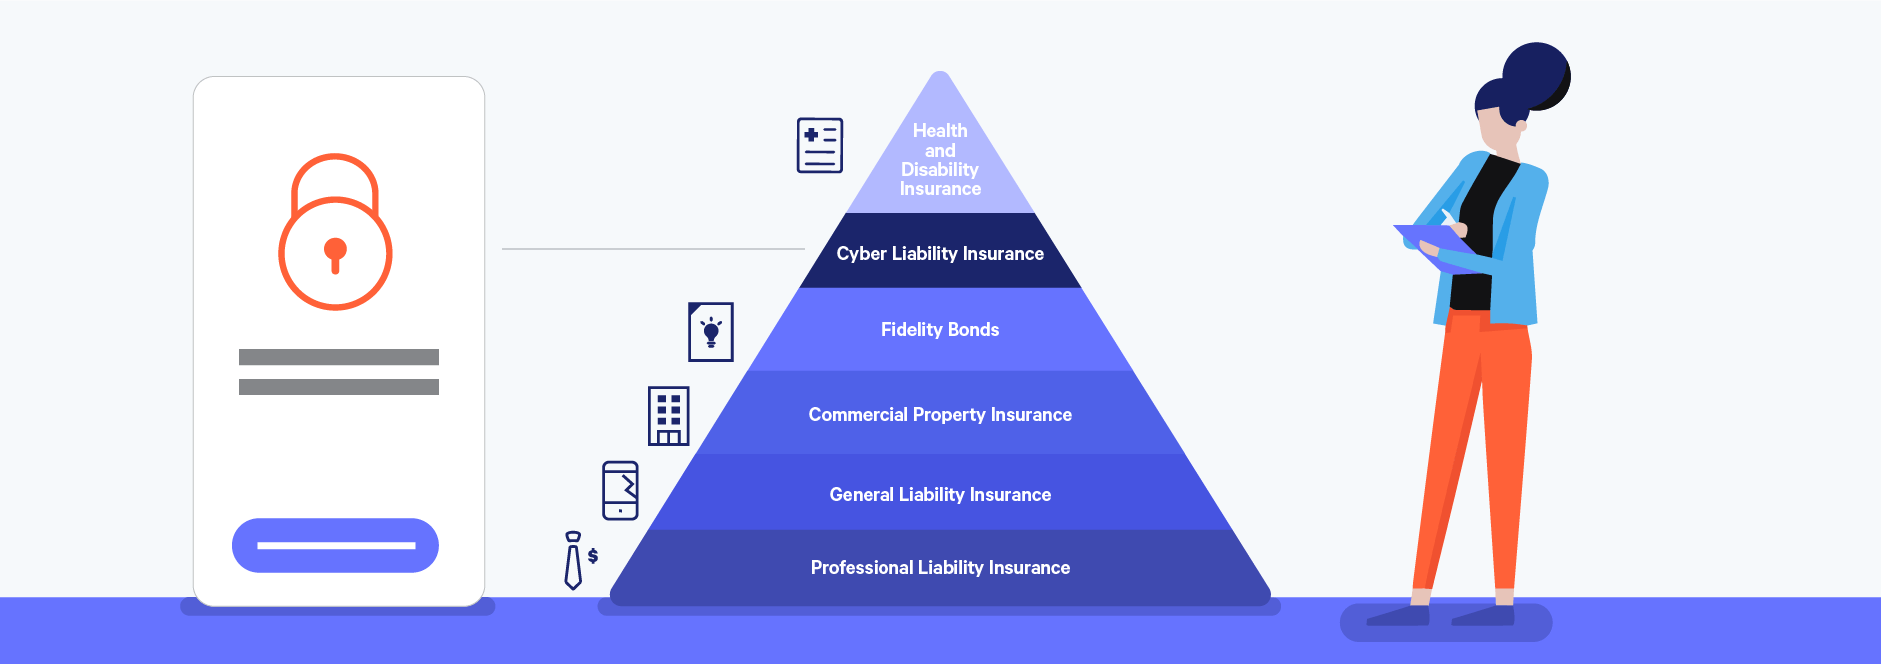 cyber liability insurance as a key freelance insurance policy illustration